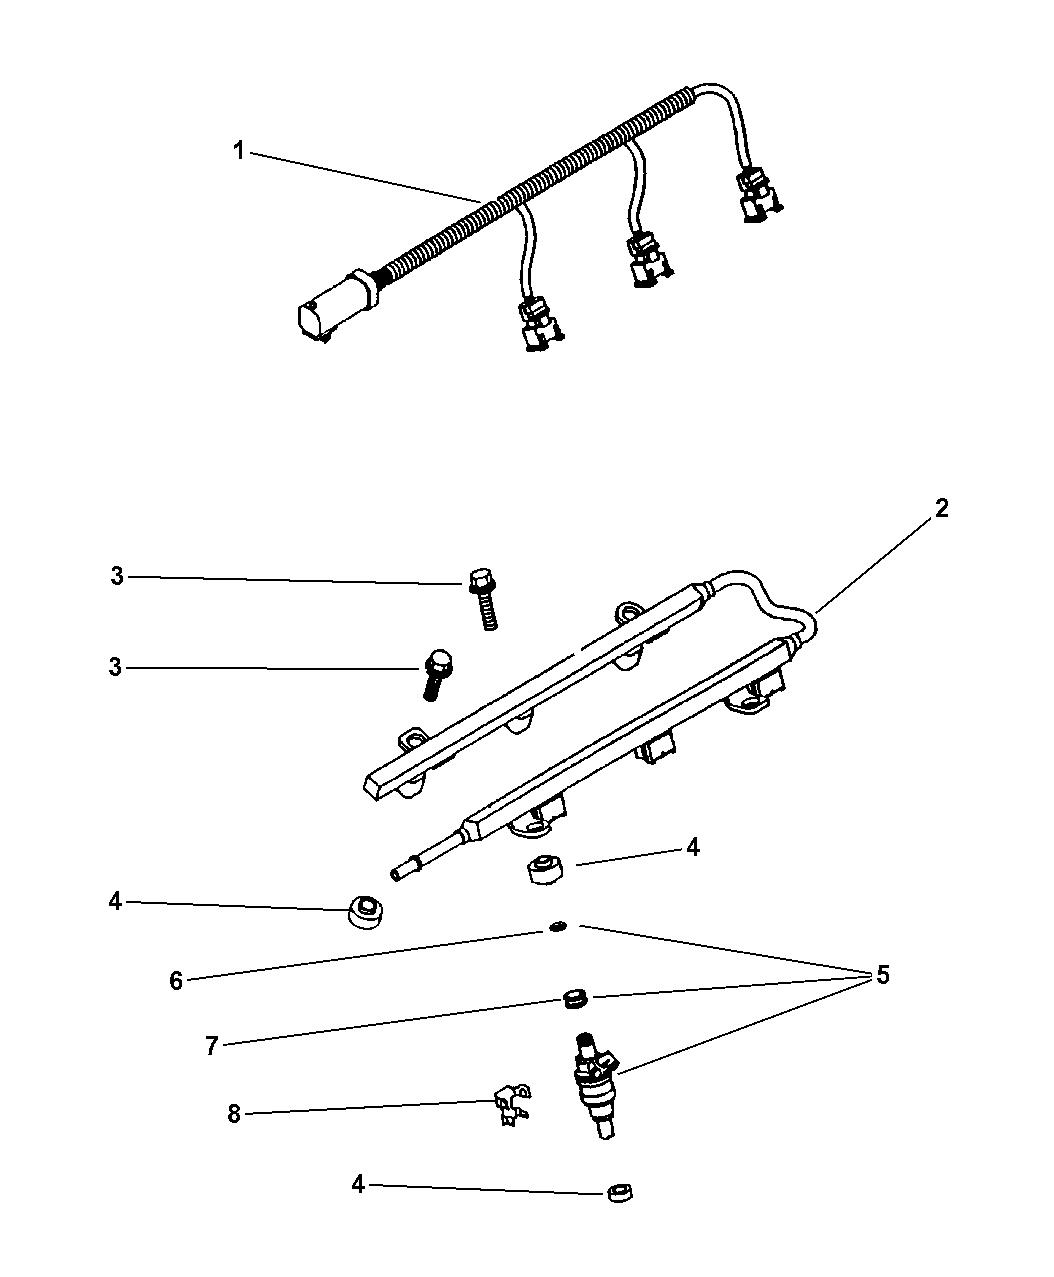 2000 Dodge Stratus Fuel Rail Mopar Parts Giant Pump Wiring Diagram Thumbnail 1